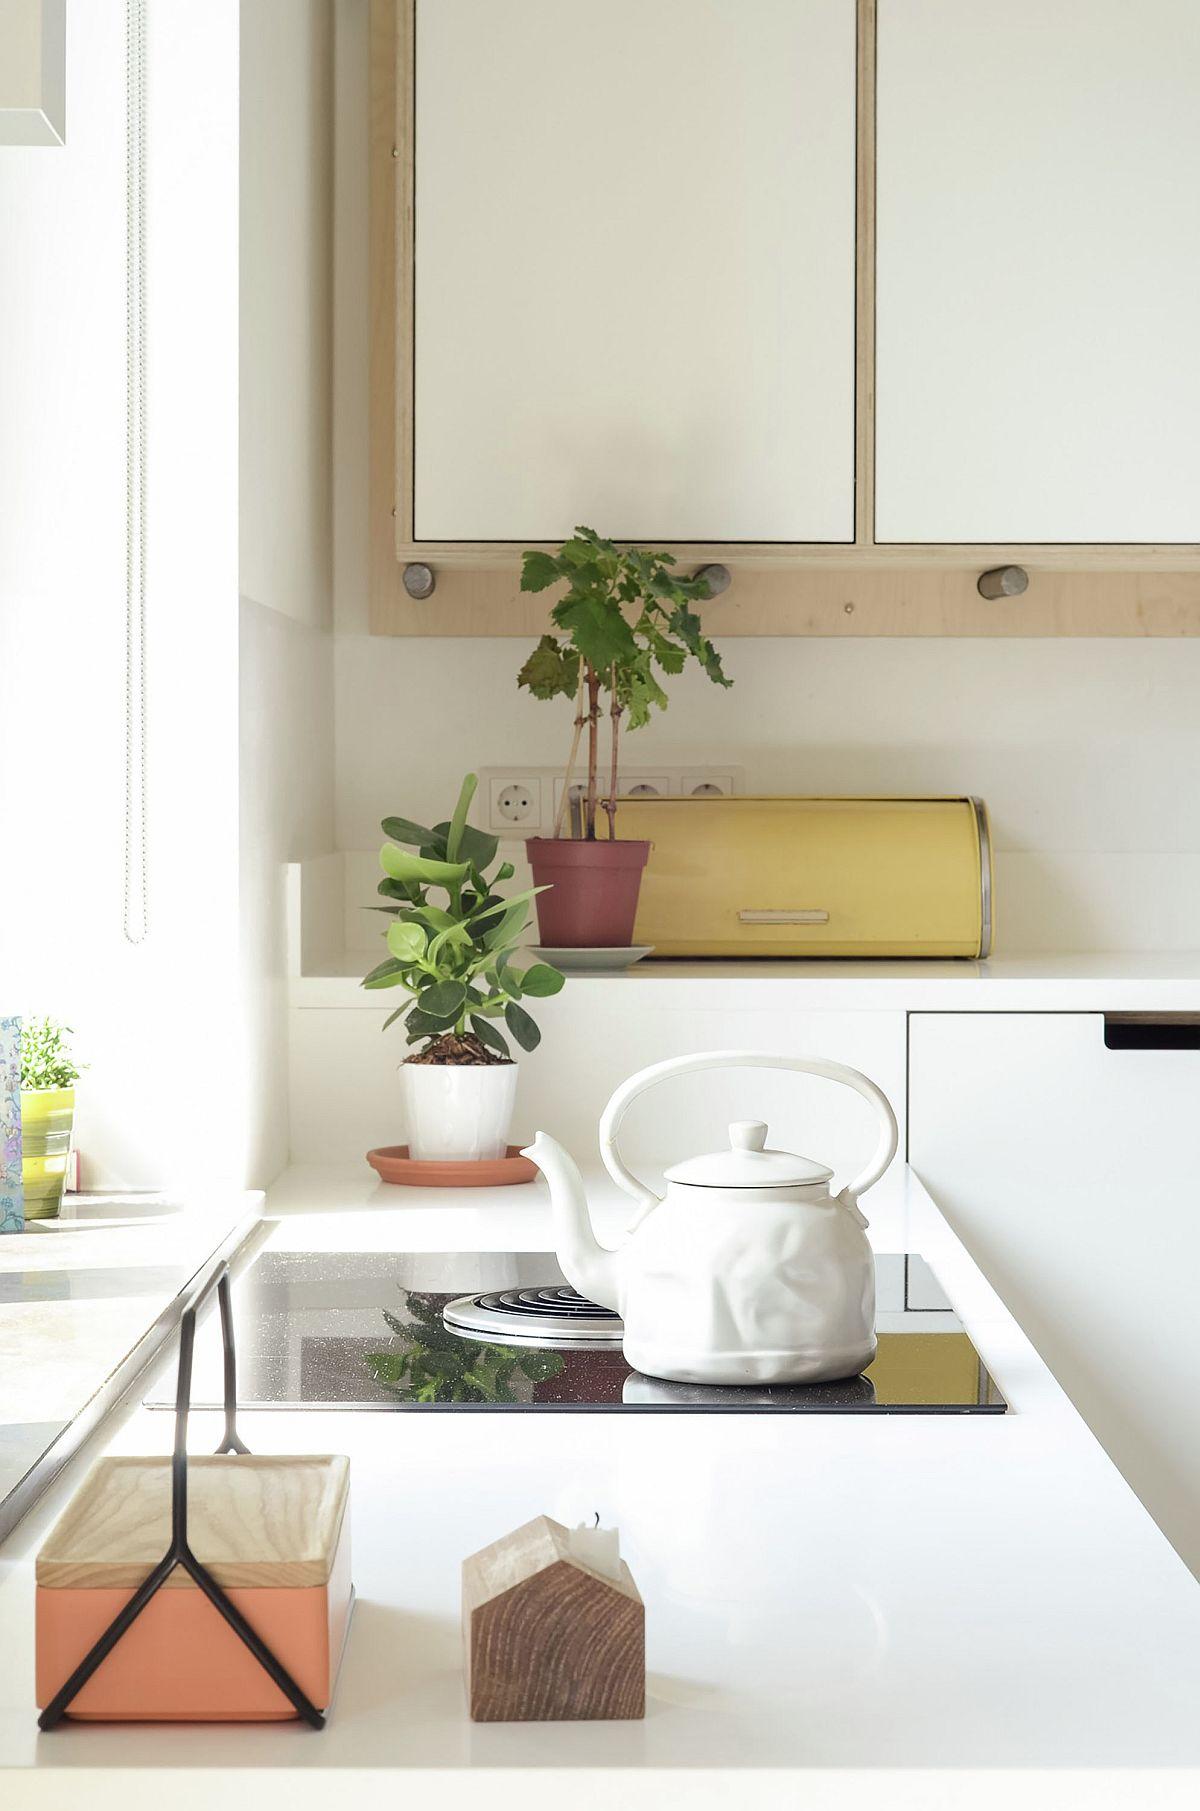 Elegant and functional kitchen worktops